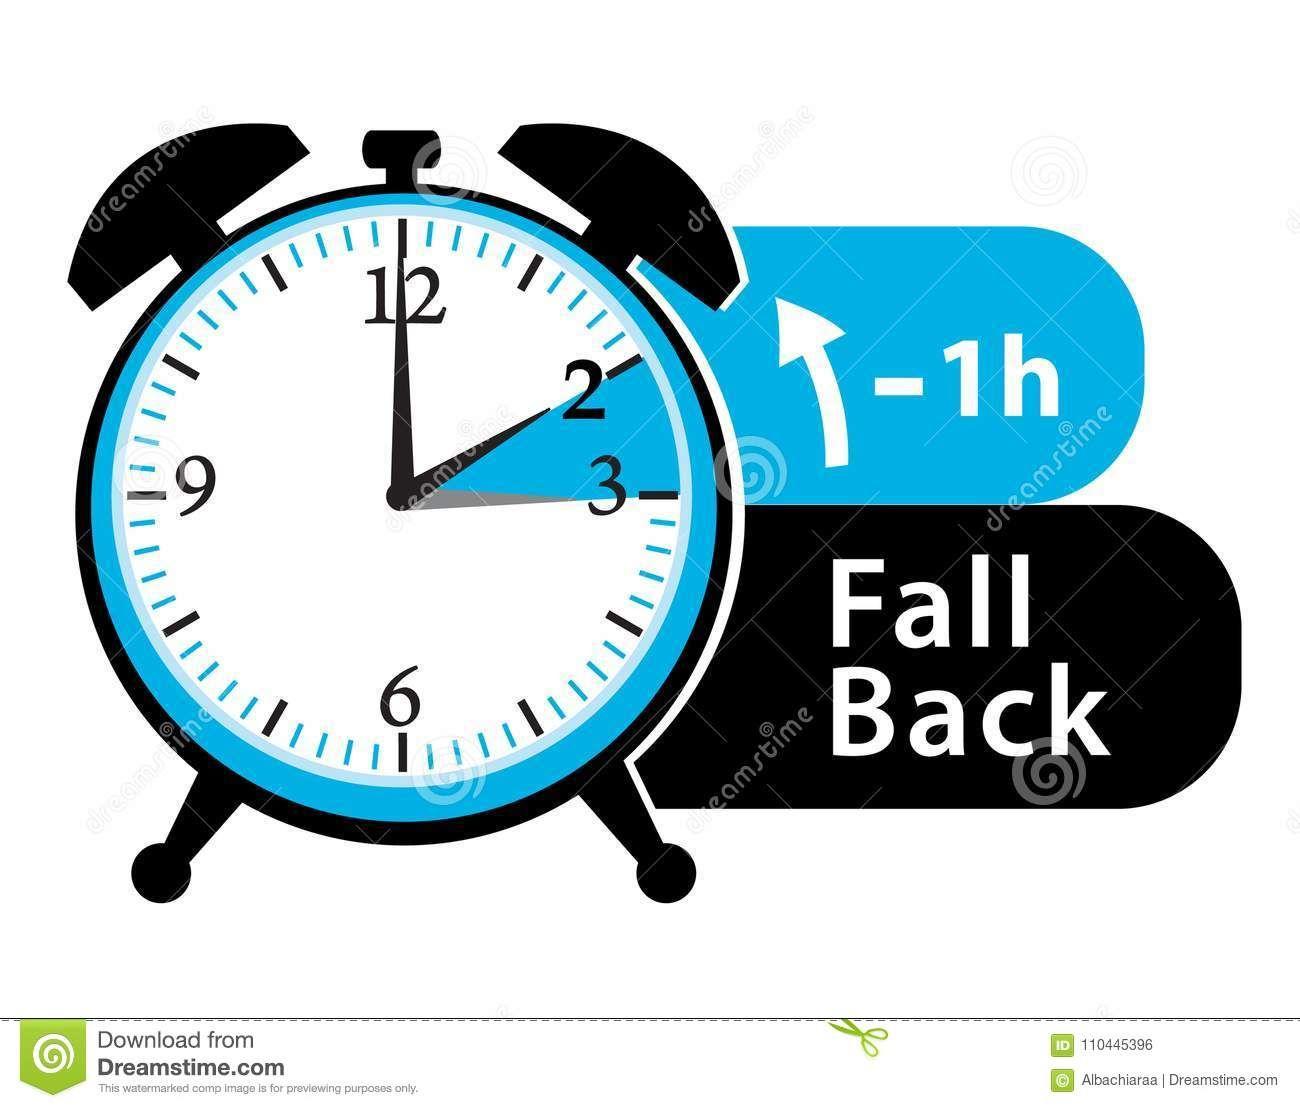 Daylight Saving Time. Fall Back Alarm Clock Icon. Stock